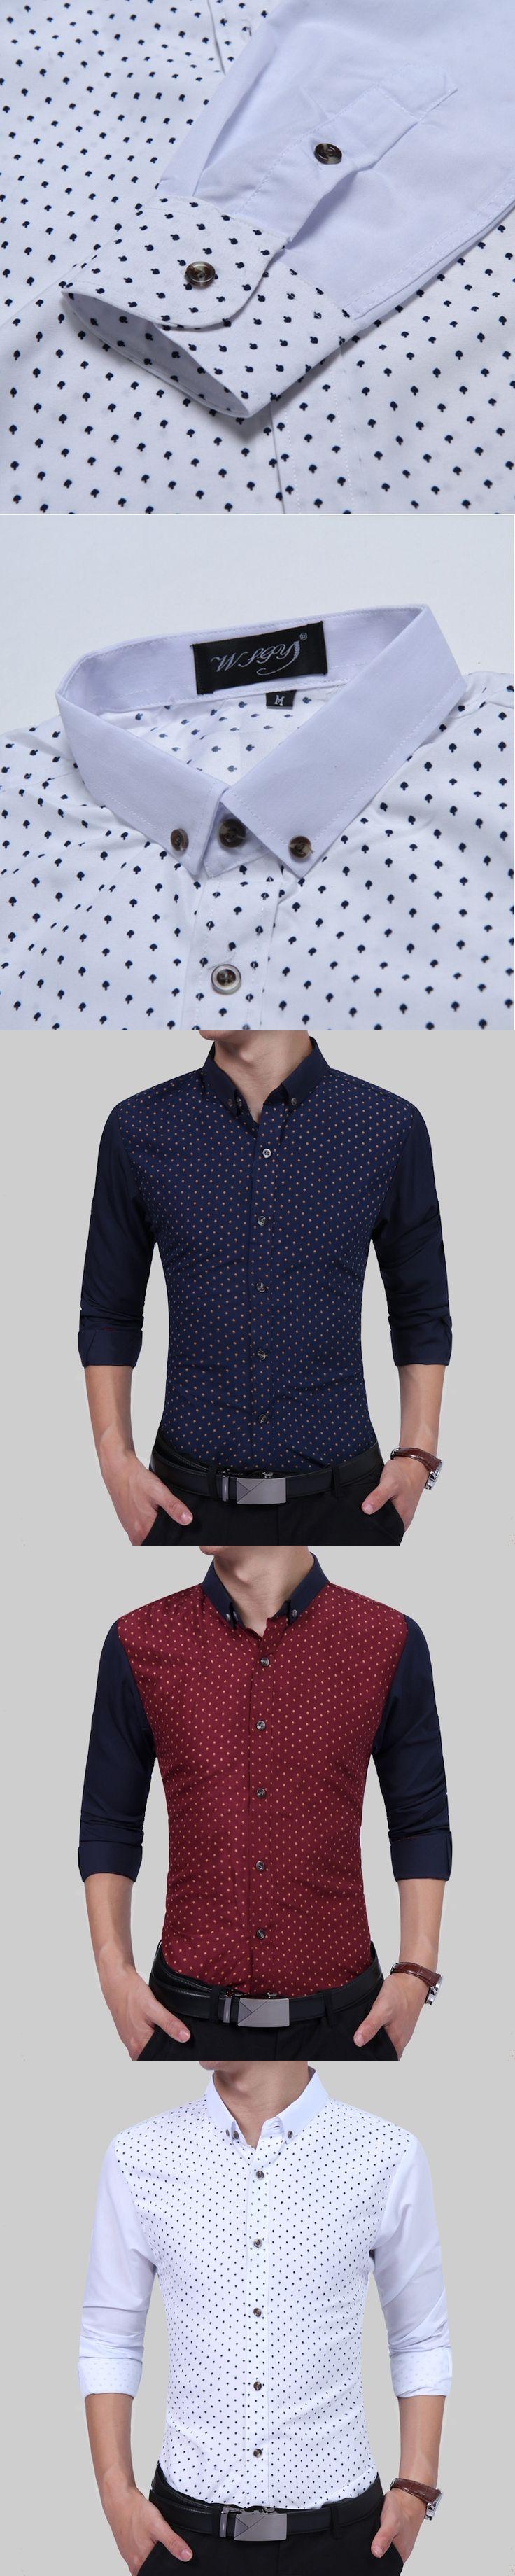 2017 New Autumn Fashion Brand Men Clothes Slim Fit Men Long Sleeve Shirt Men Polka Dot Casual Men Shirt Social Plus Size 3XL